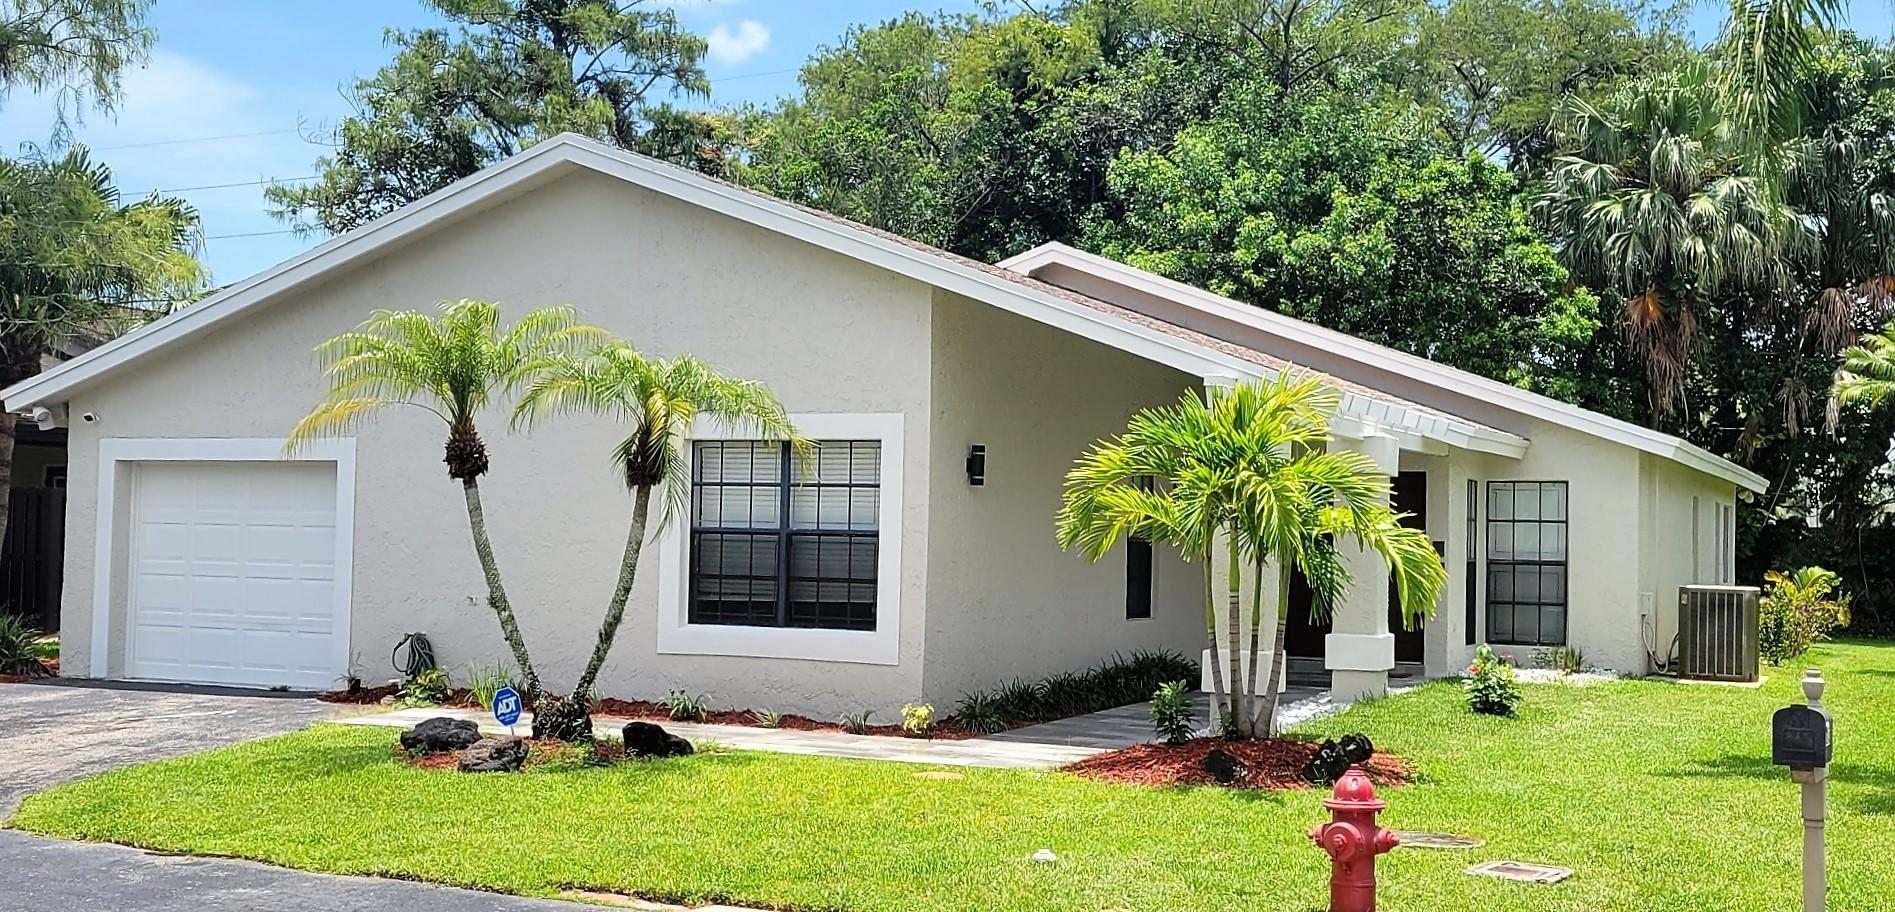 8943 Old Pine Road #16, Boca Raton, FL 33433 - MLS#: RX-10730055